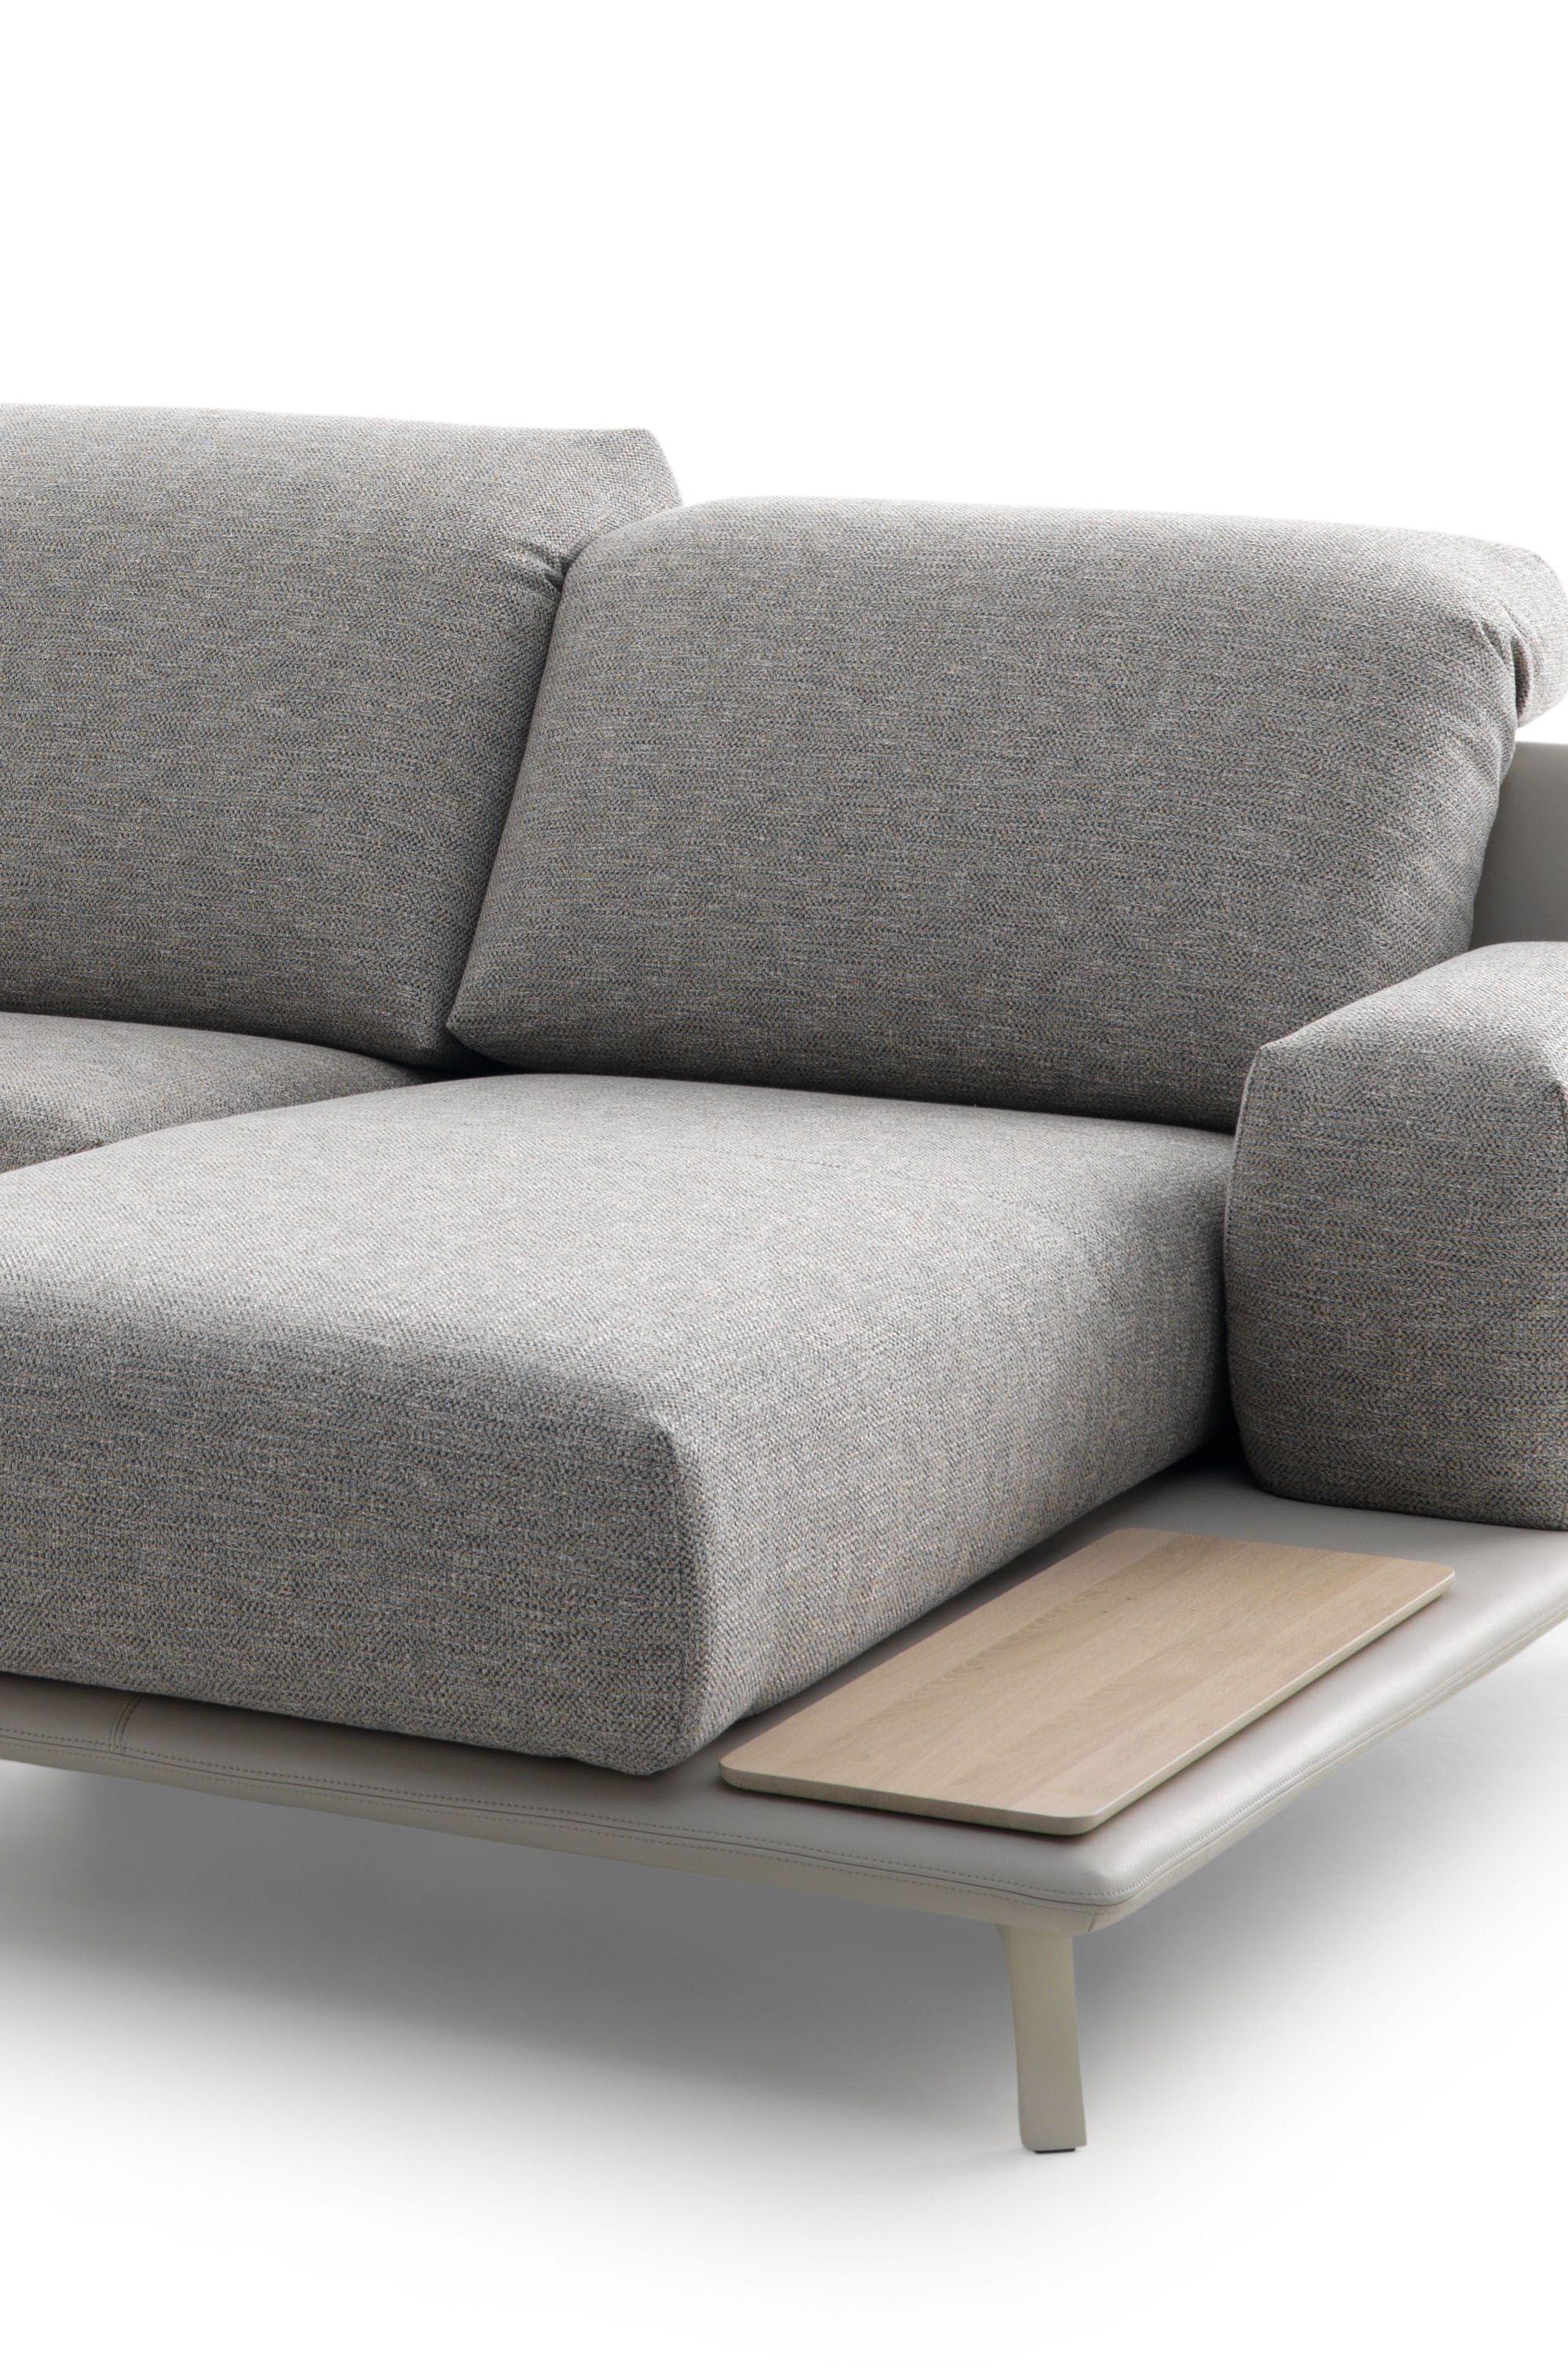 Leolux Paleta Sofa On Display In Beaufort Moira Northern Ireland Sofa Inspiration Sofa Luxury Furniture